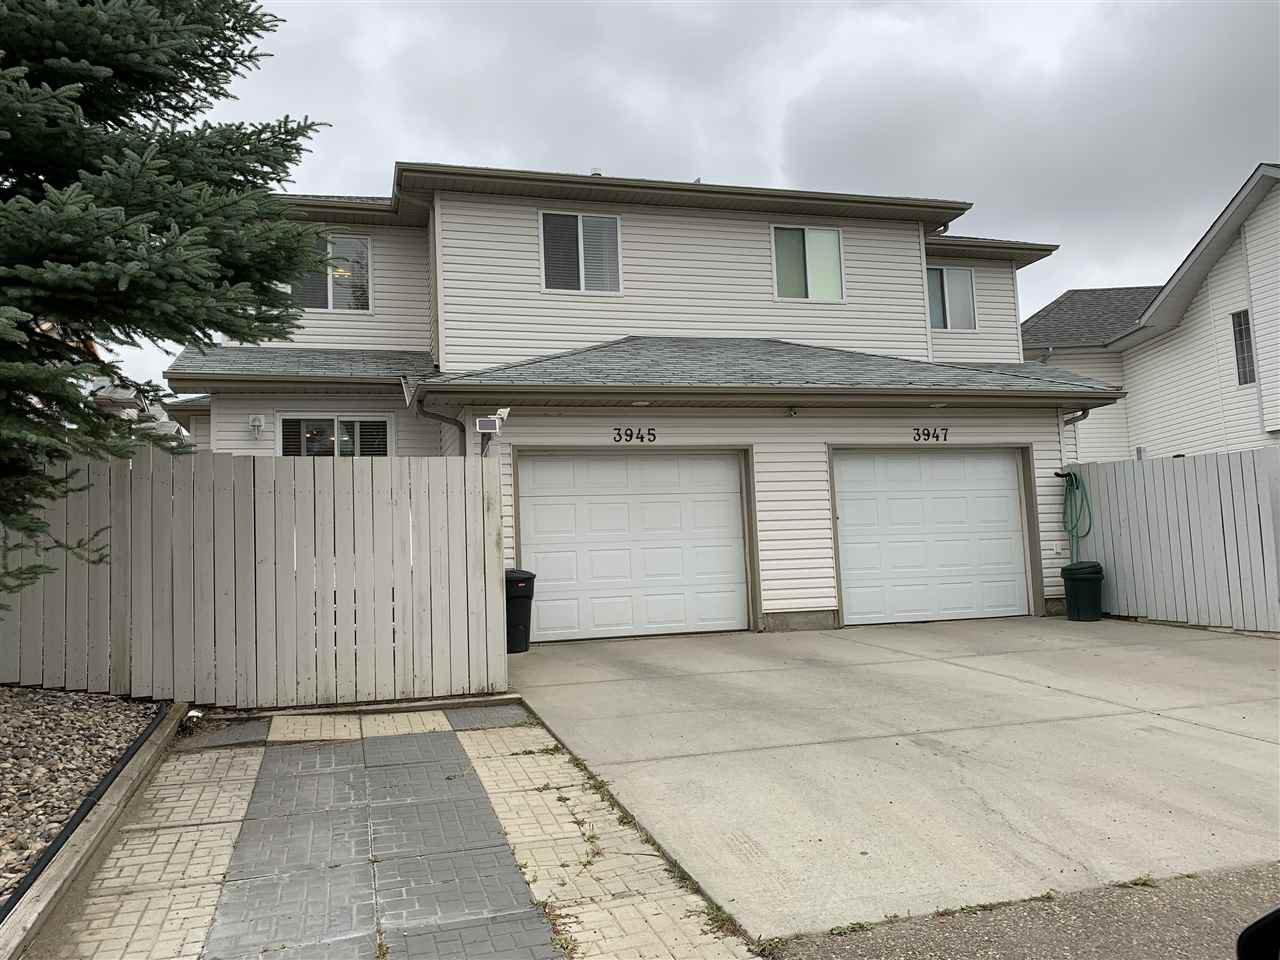 Main Photo: 3945 38 Street in Edmonton: Zone 29 House Half Duplex for sale : MLS®# E4214230